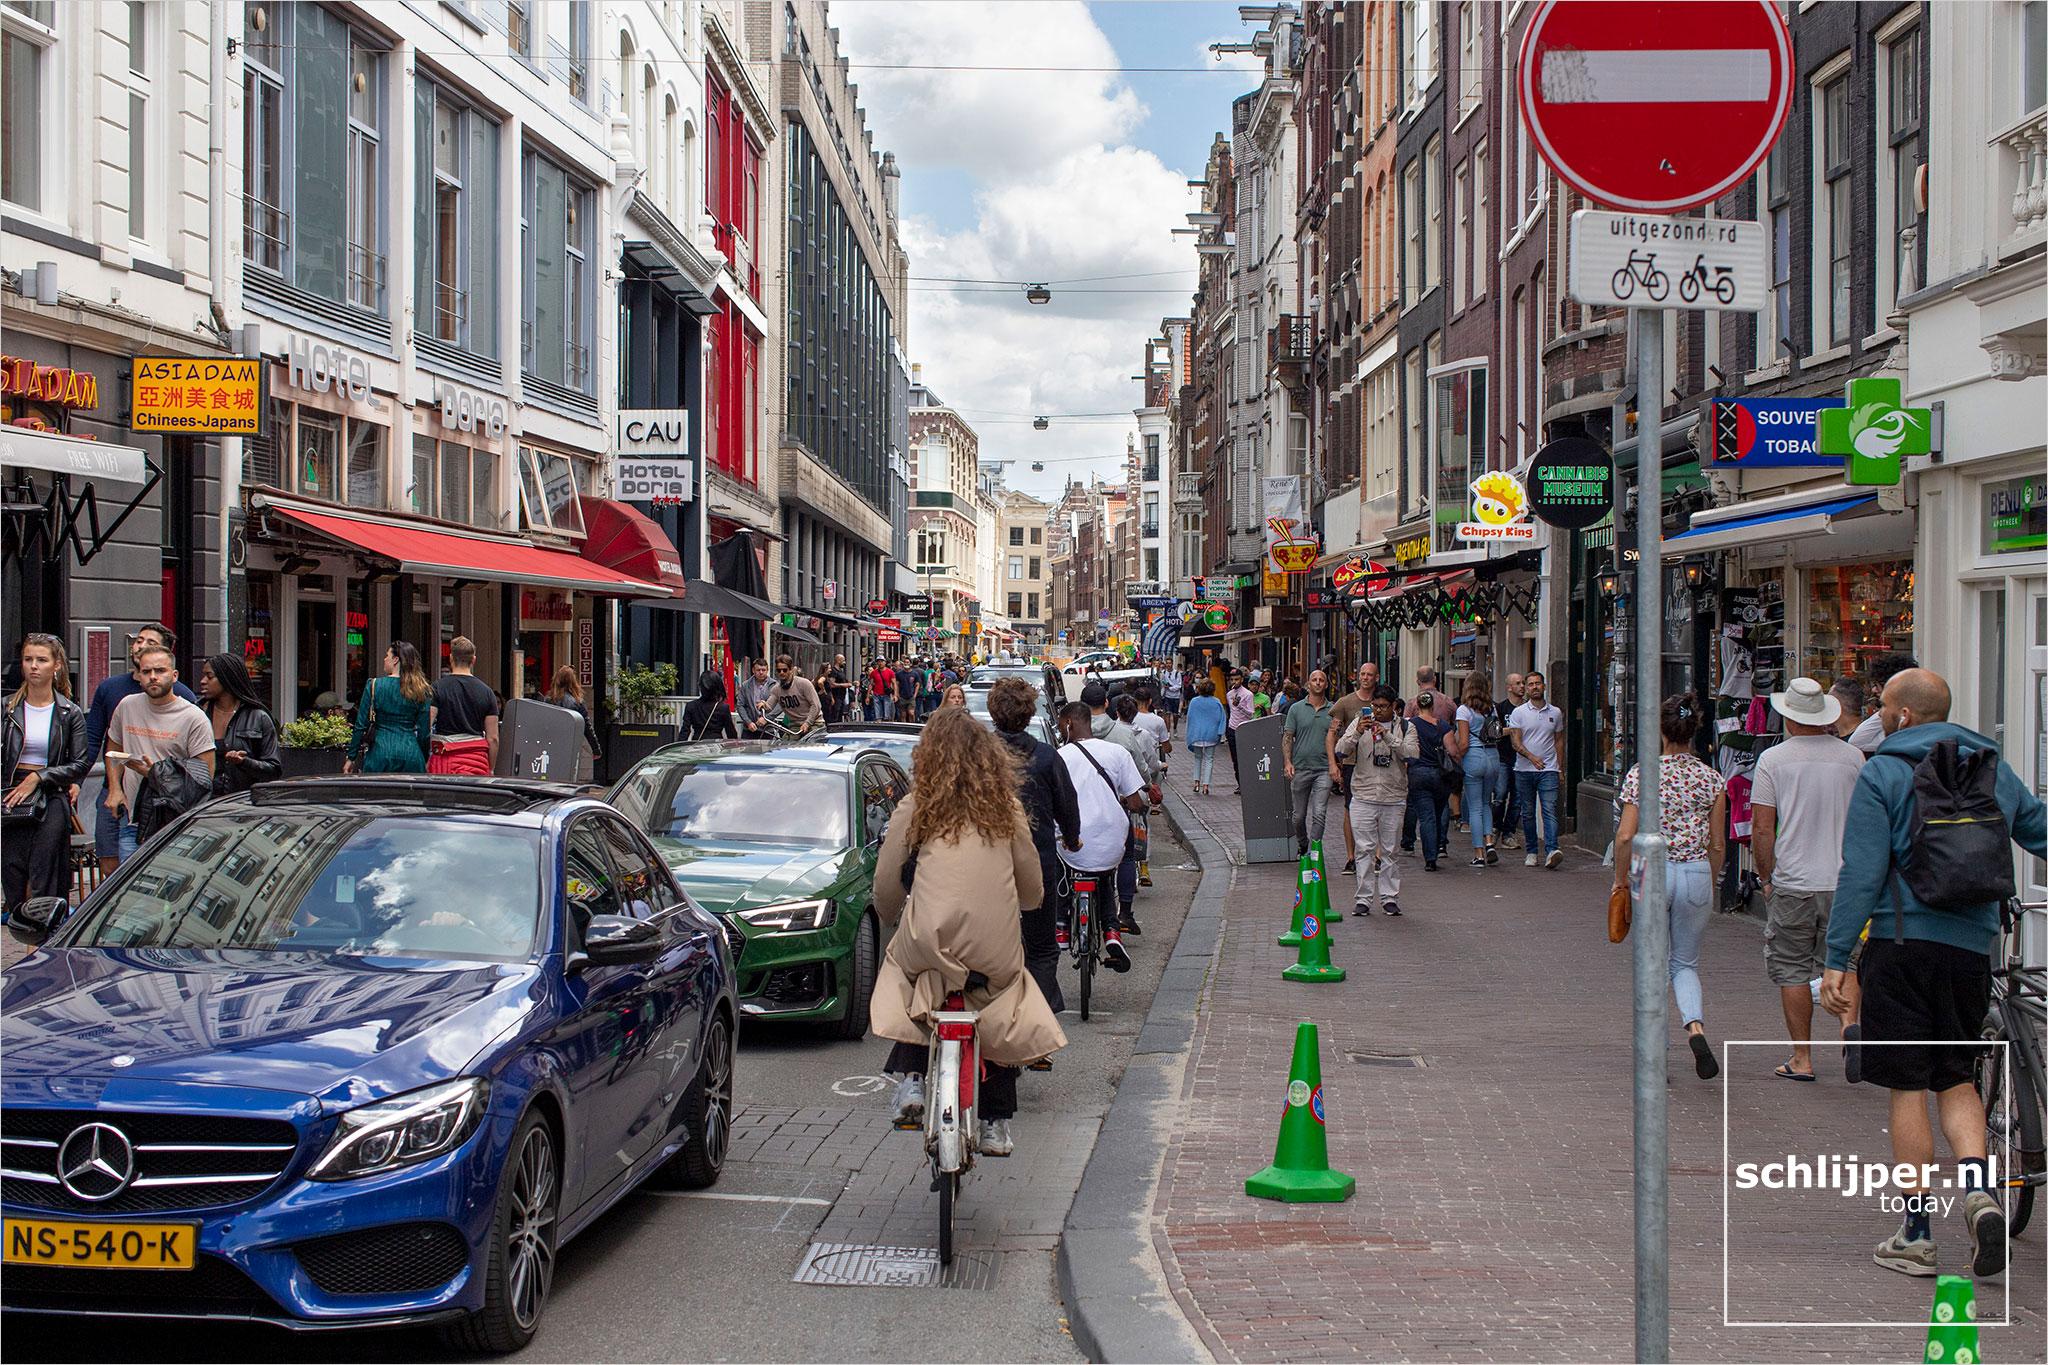 Nederland, Amsterdam, 28 juni 2020